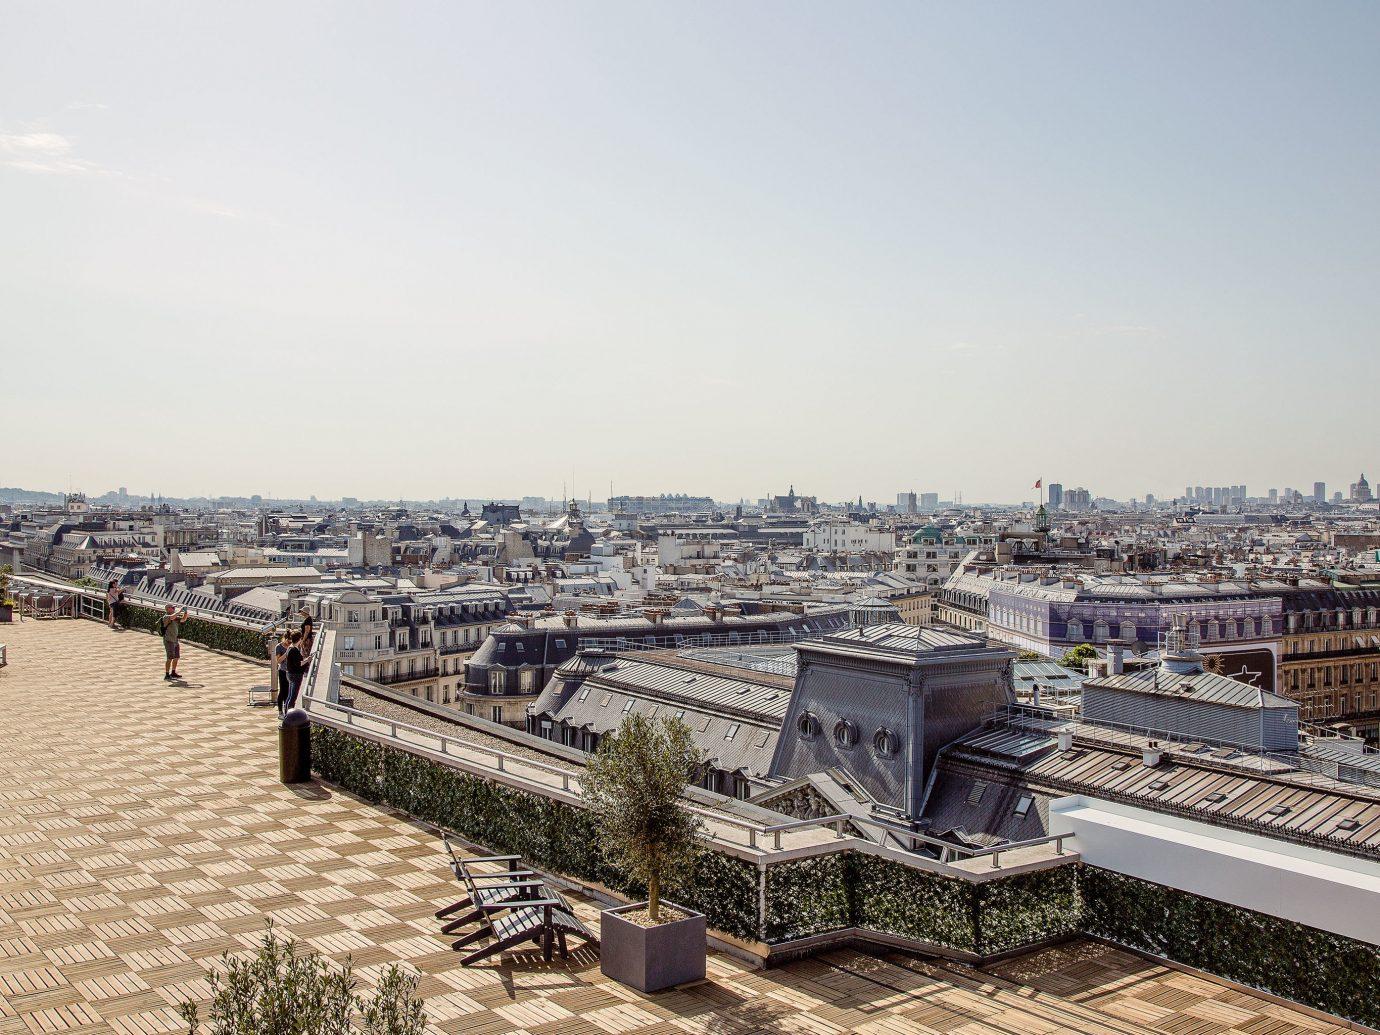 Food + Drink Paris Trip Ideas outdoor sky urban area City cityscape Sea roof building skyline horizon metropolis day several